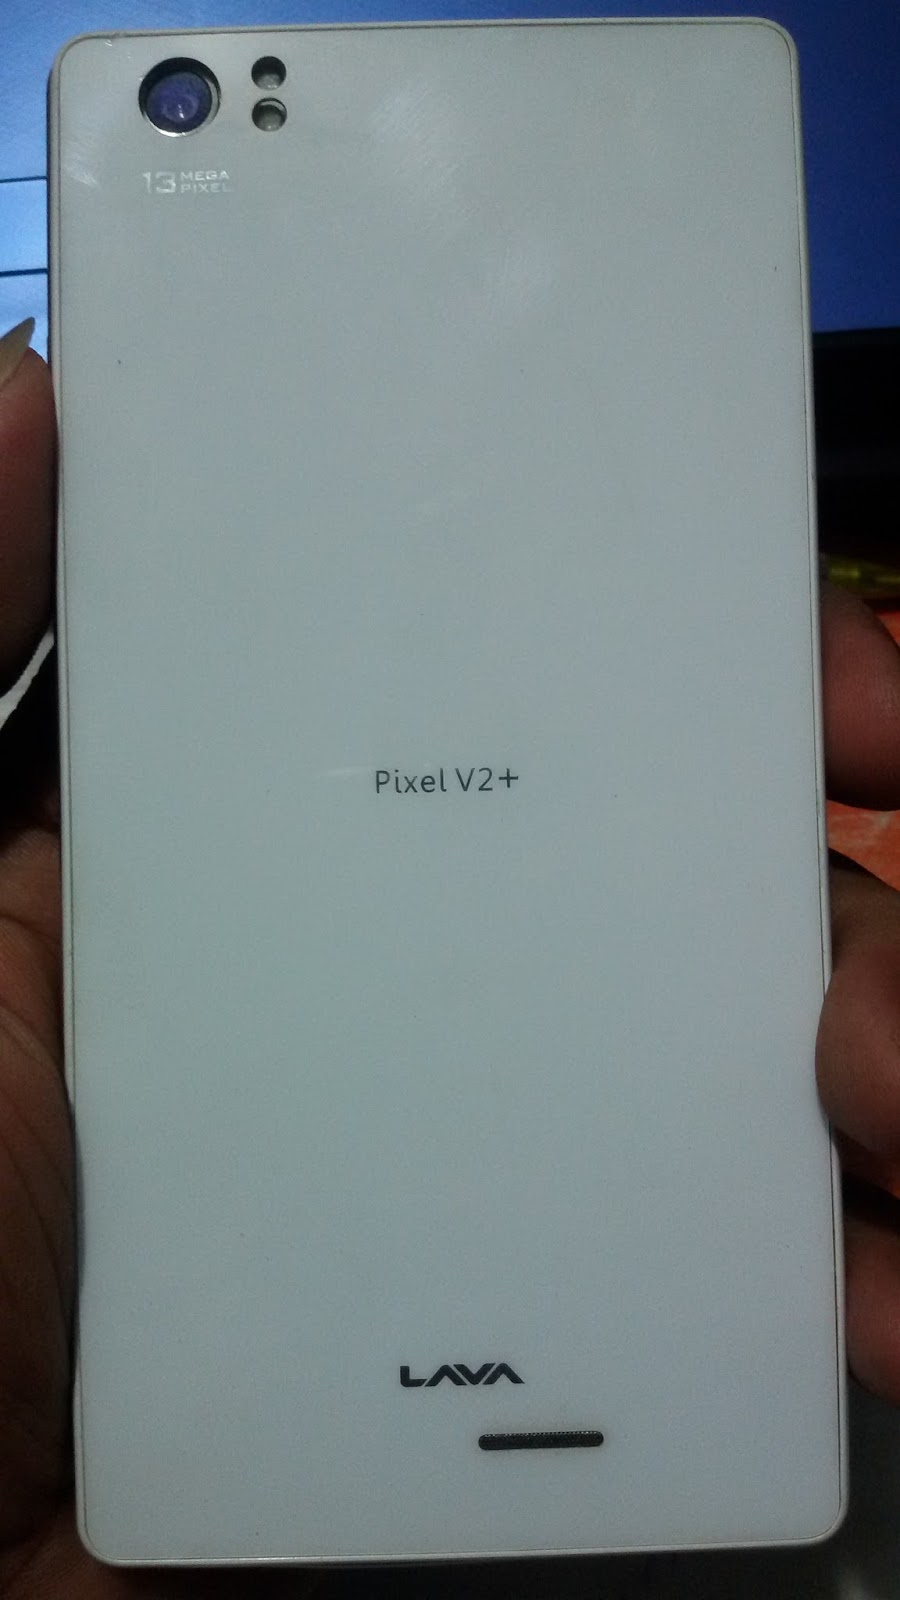 Gsm_Sujan: Lava Pixel V2 Plus Stock Firmware ROM (Flash File